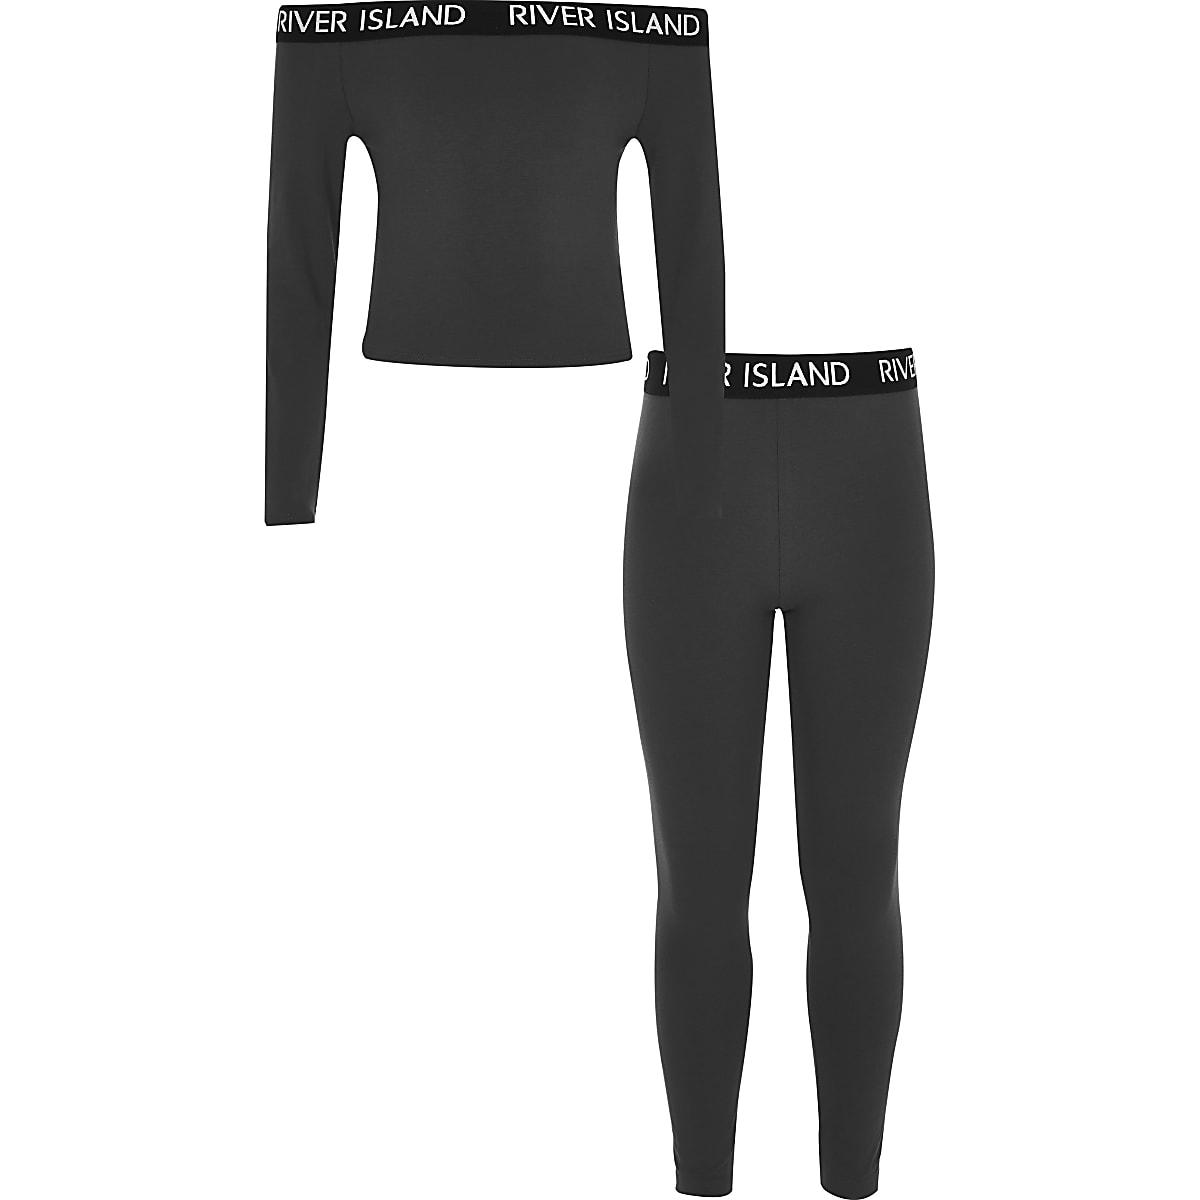 Girls grey RI bardot top and legging outfit